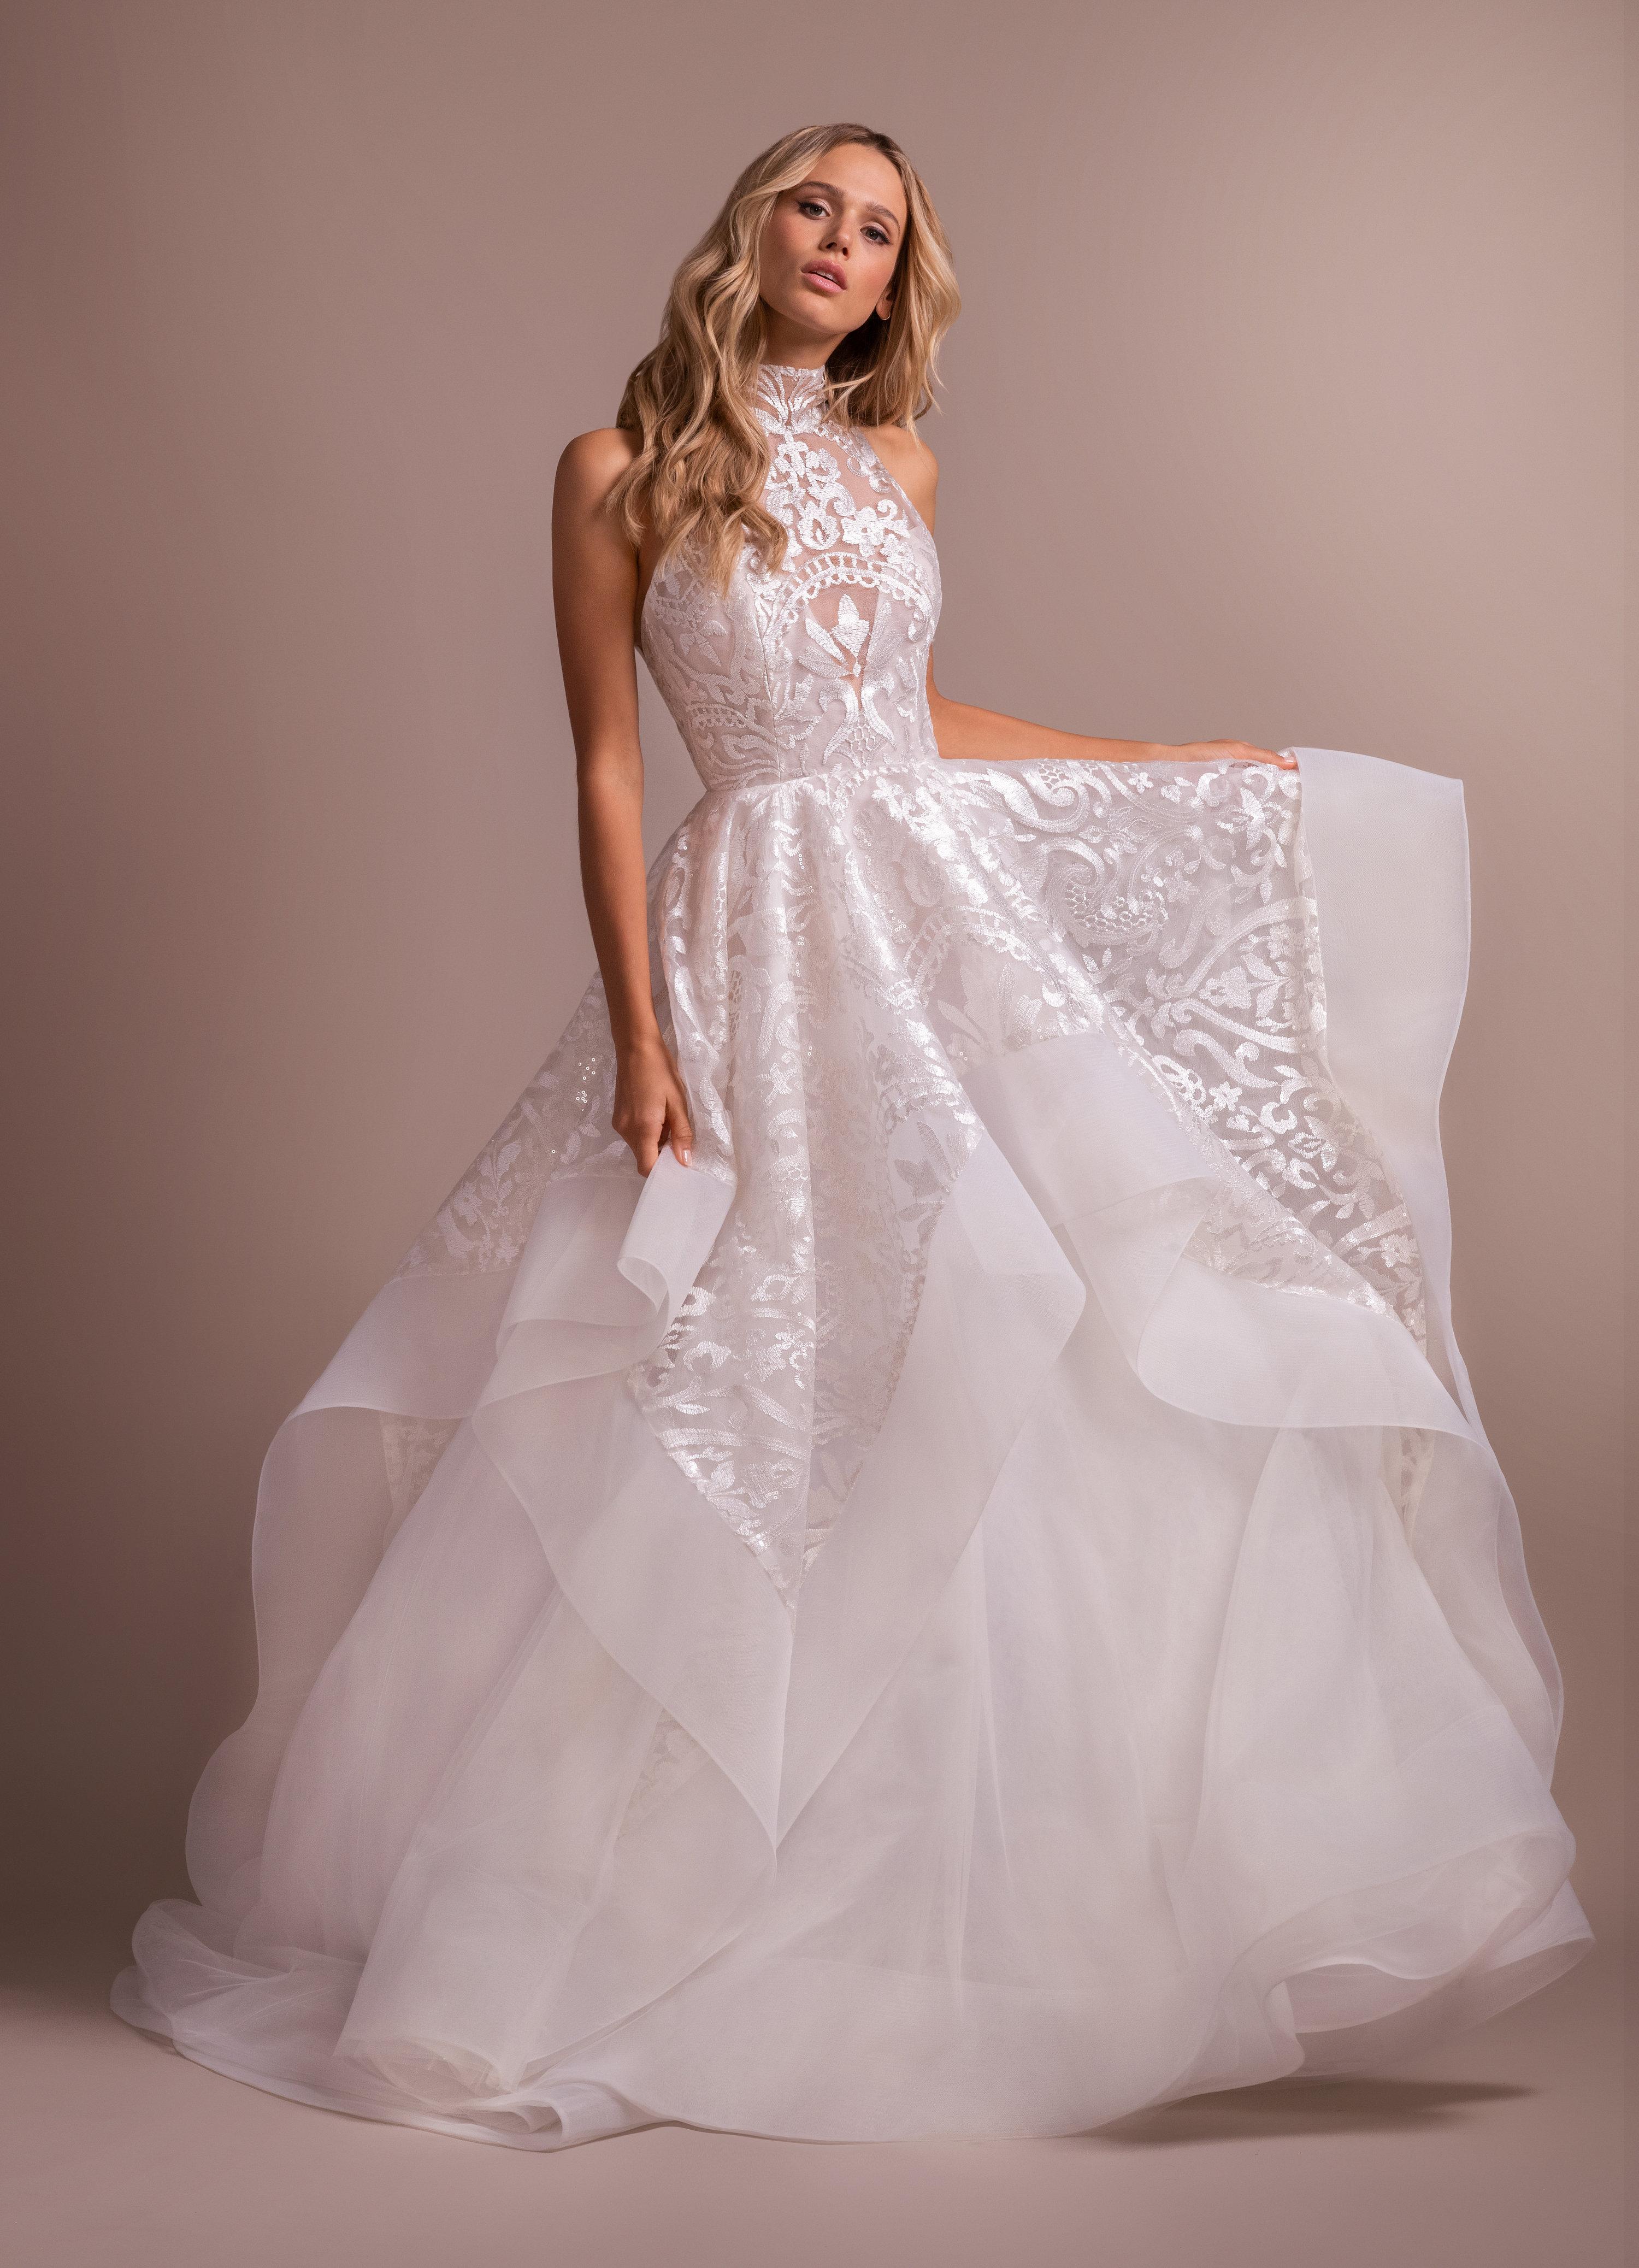 Wedding Dress Designer Hayley Paige Tells Us How to Pick